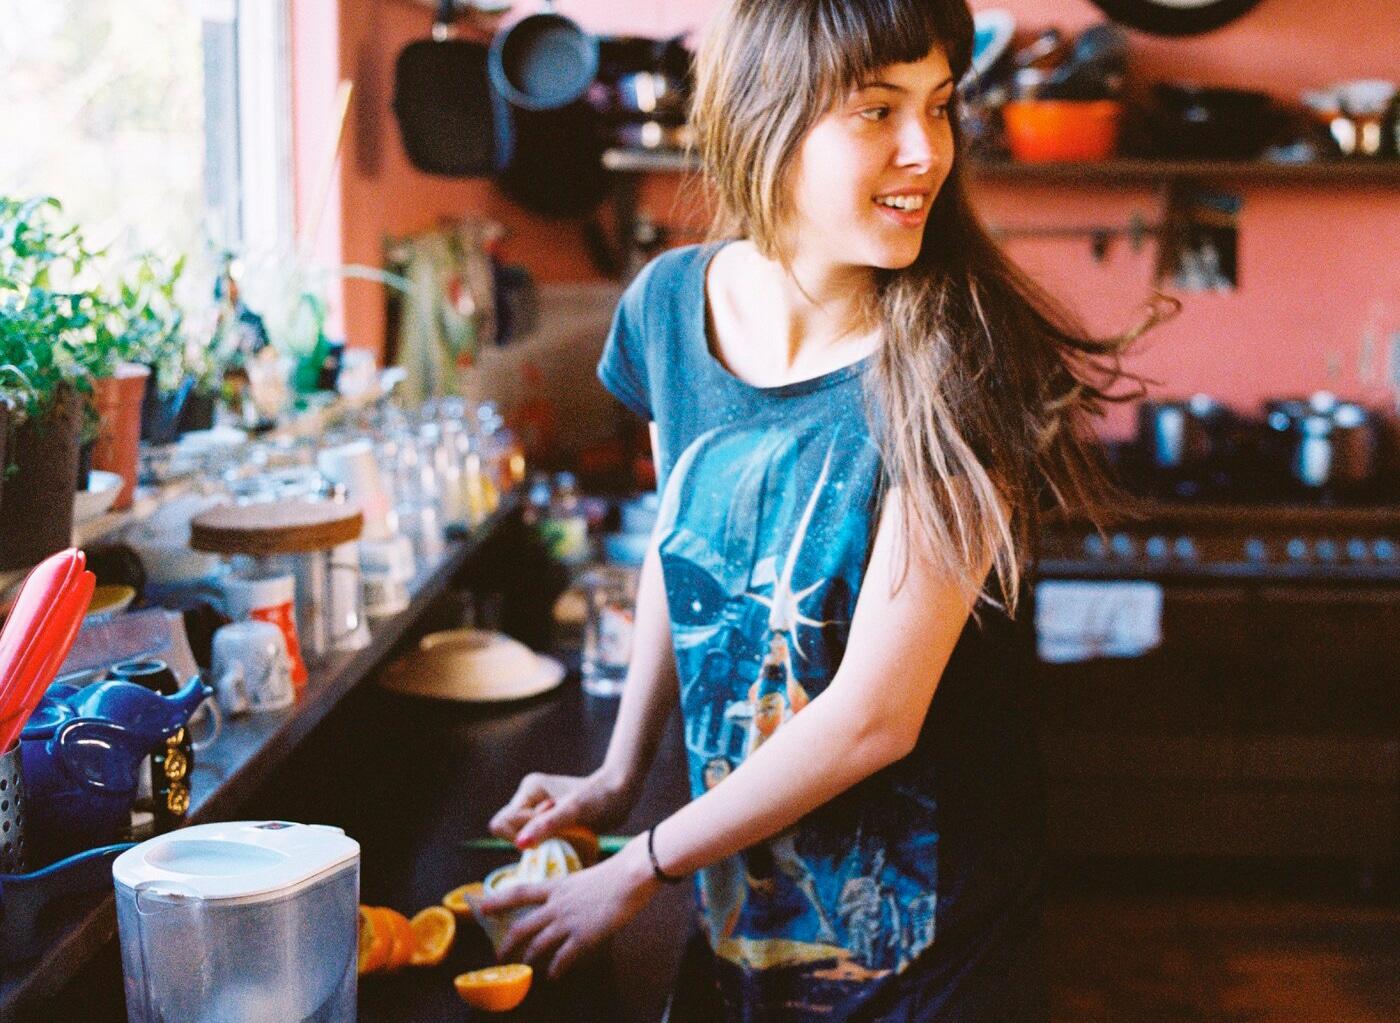 A woman in a kitchen peeling a citrus fruit.